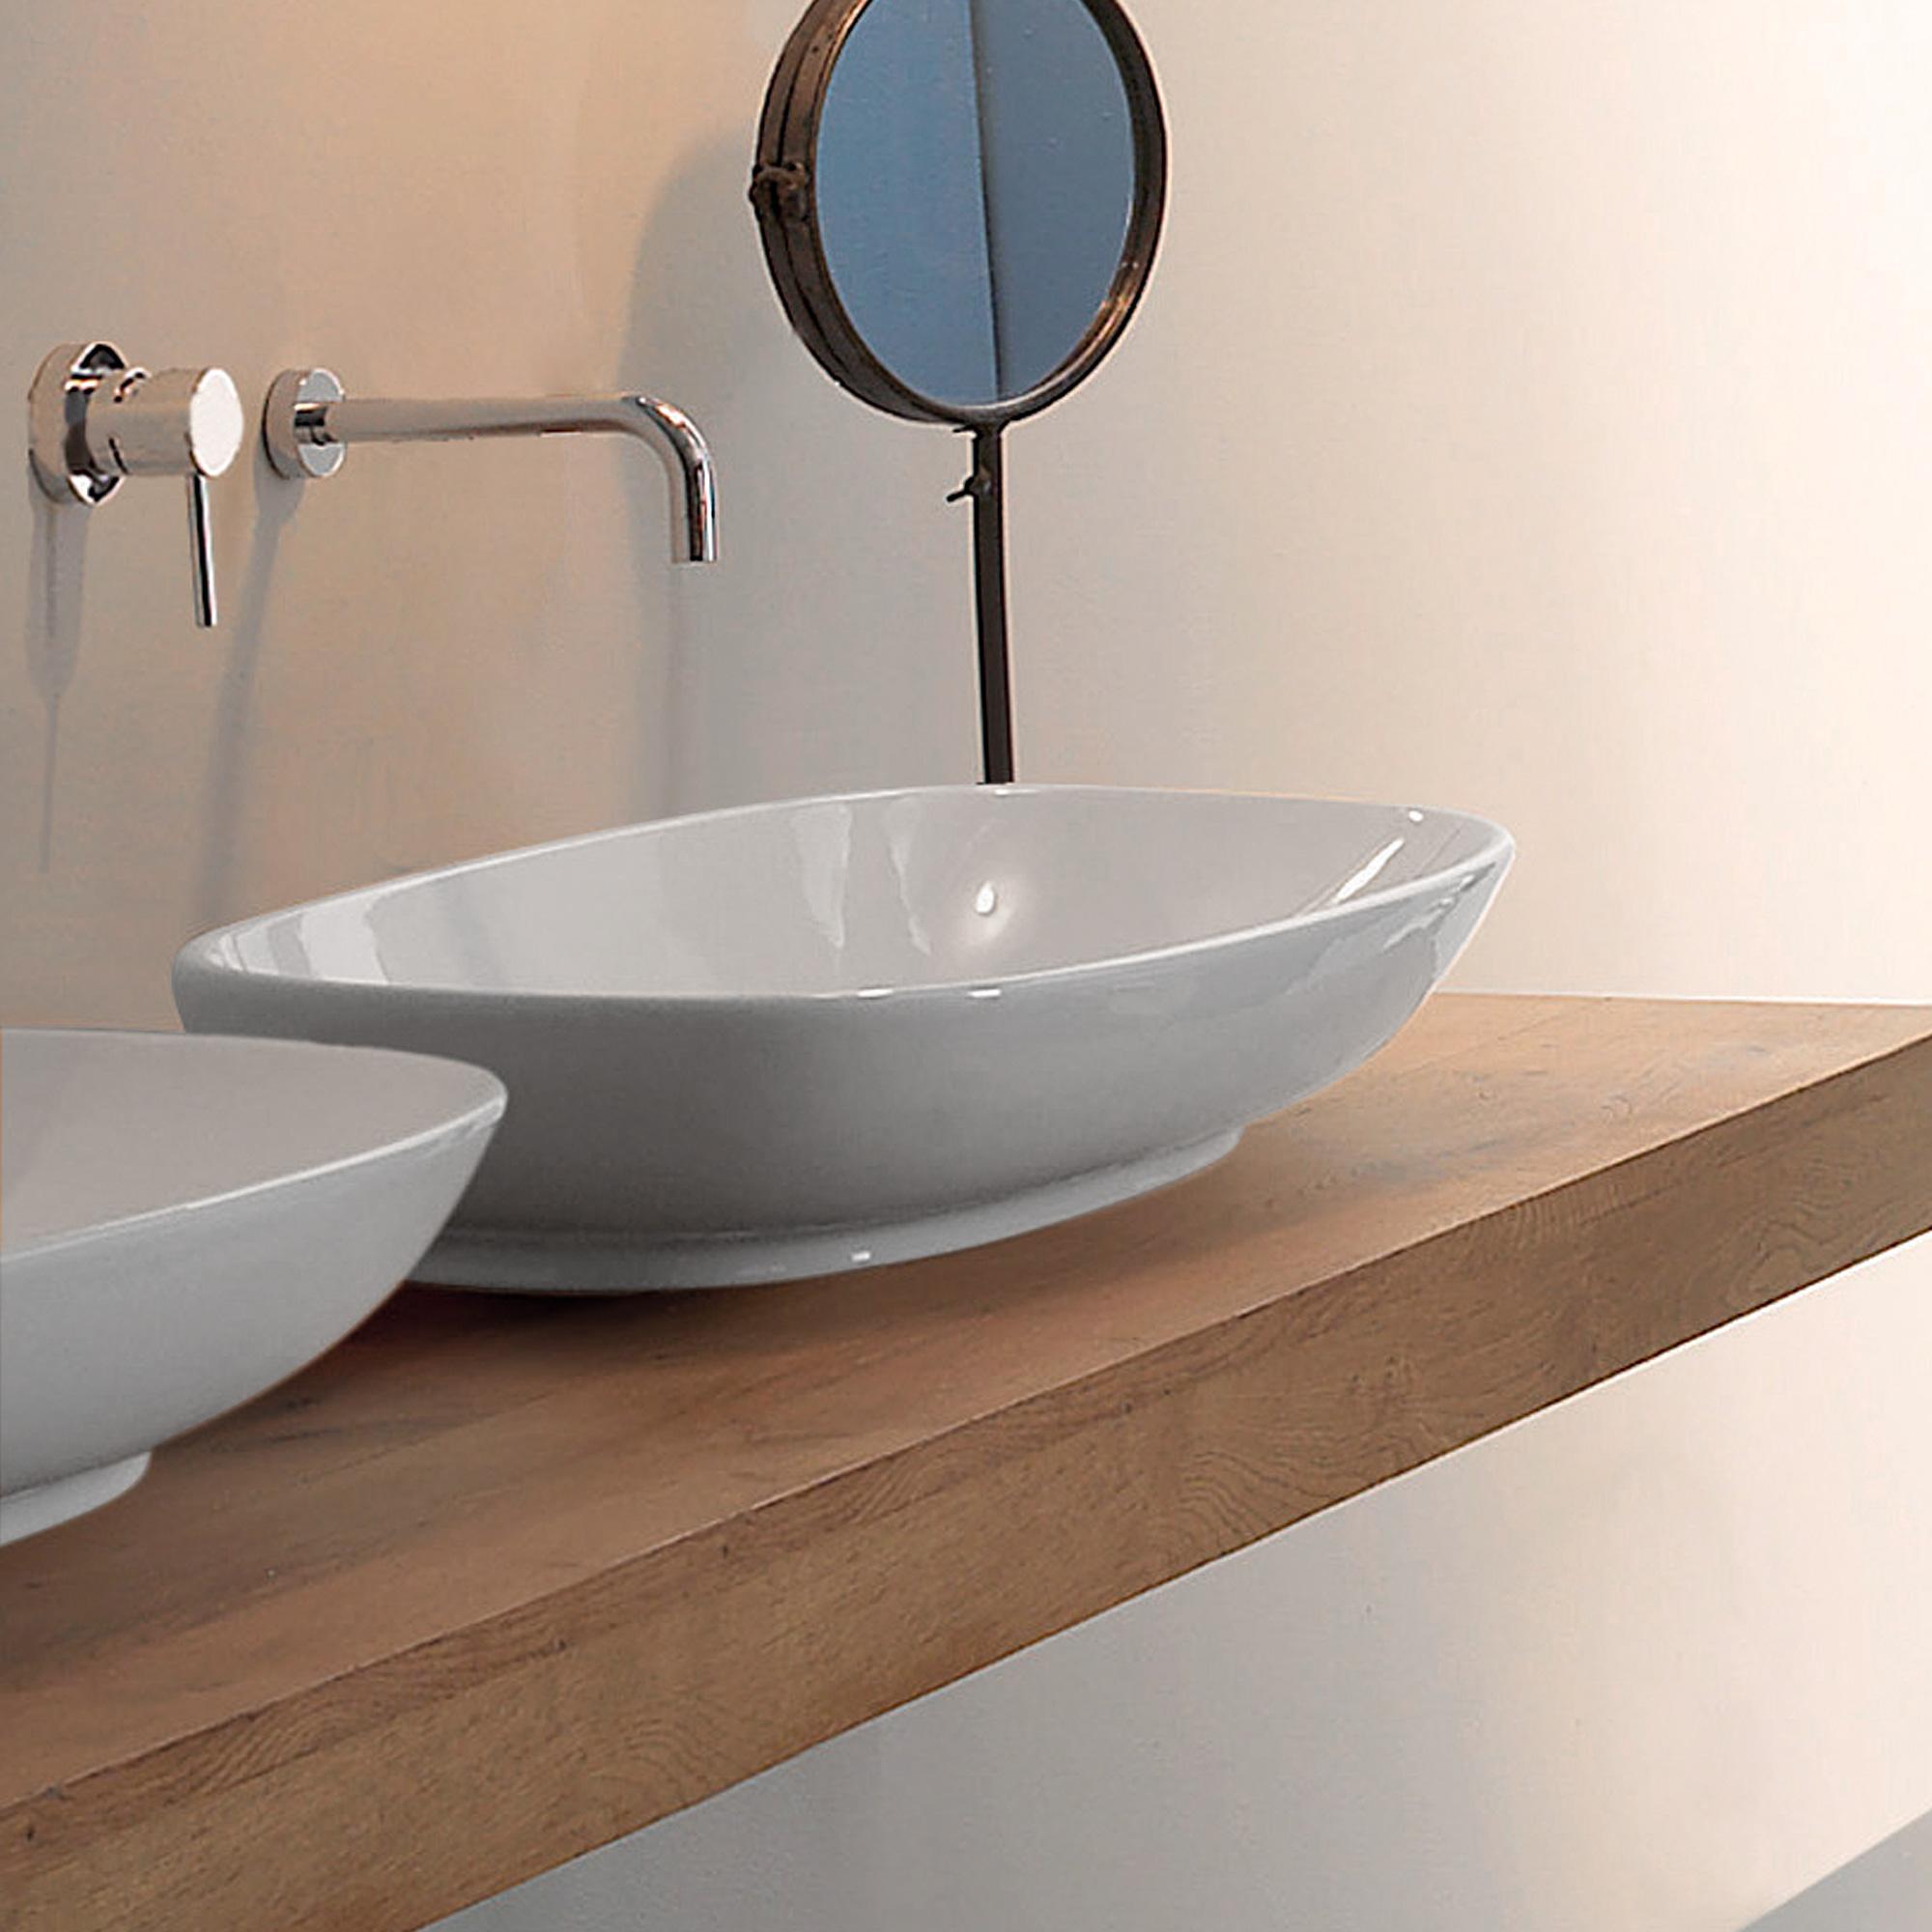 globo stockholm aufsatzwaschbecken b 70 h 16 5 t 37 cm. Black Bedroom Furniture Sets. Home Design Ideas